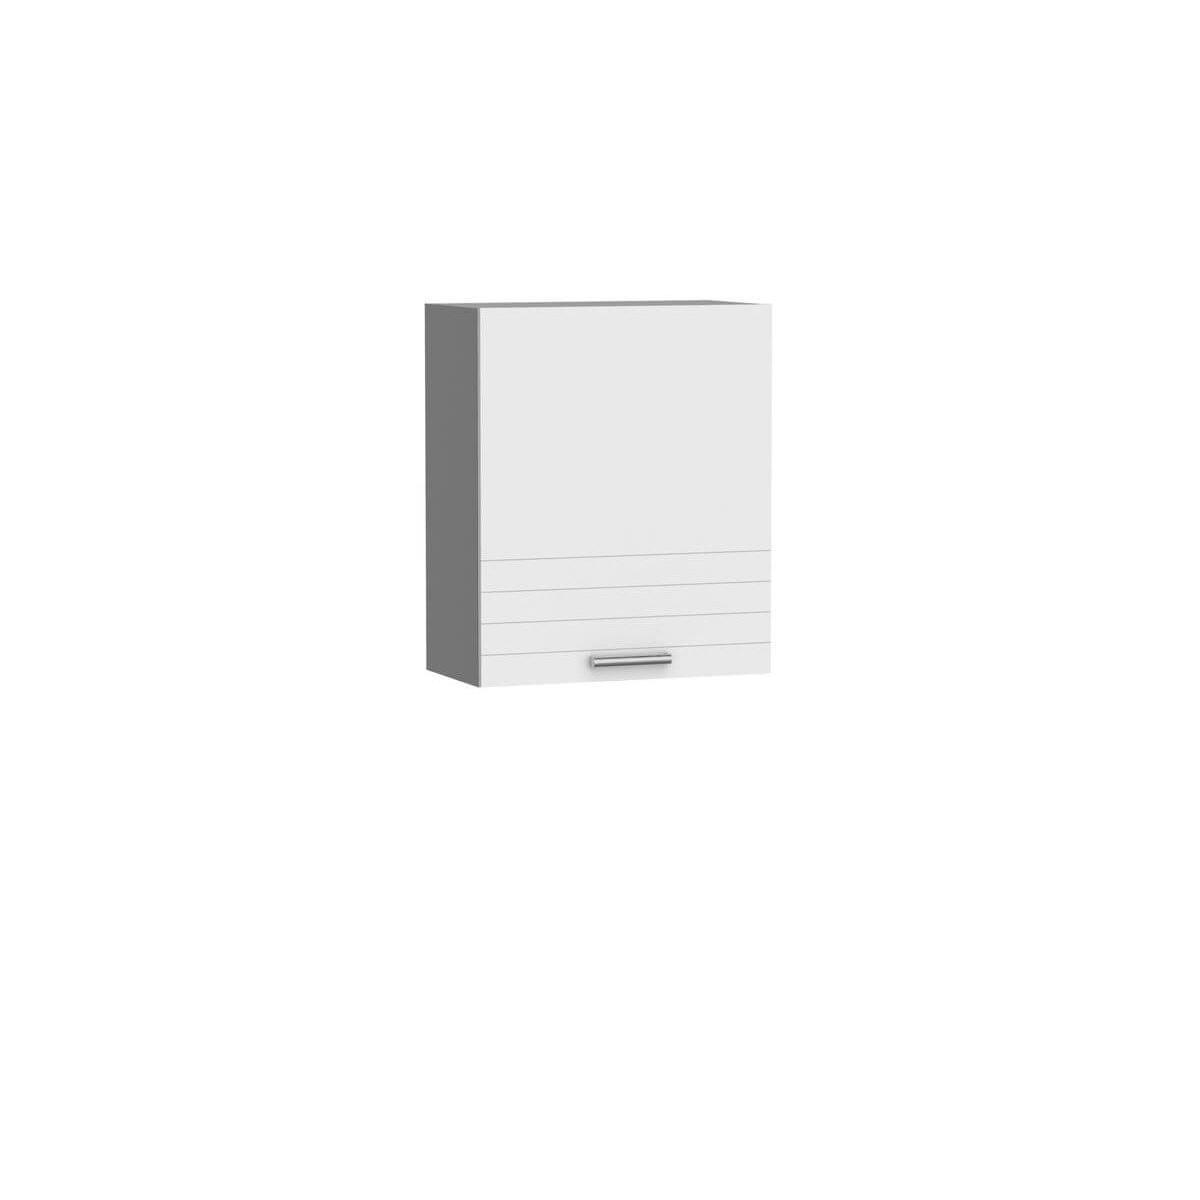 Bobochic BOBOCHIC Meuble haut 60 cm avec 1 porte ORTELIA Blanc